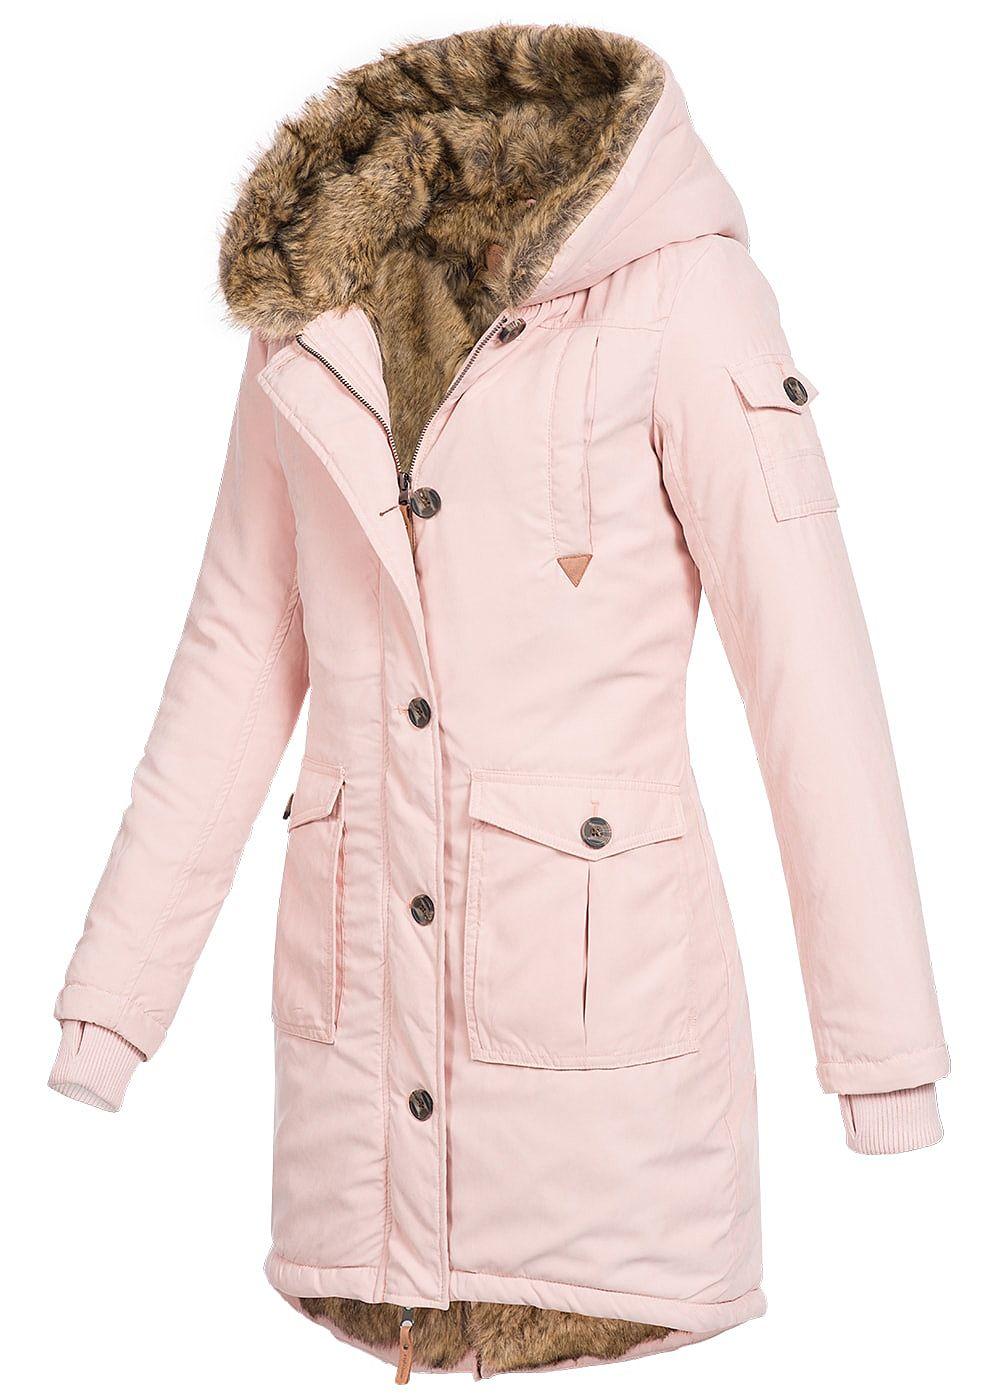 eight2nine damen winter mantel kapuze kunstfellfutter allover innen 4 pockets blush rosa. Black Bedroom Furniture Sets. Home Design Ideas